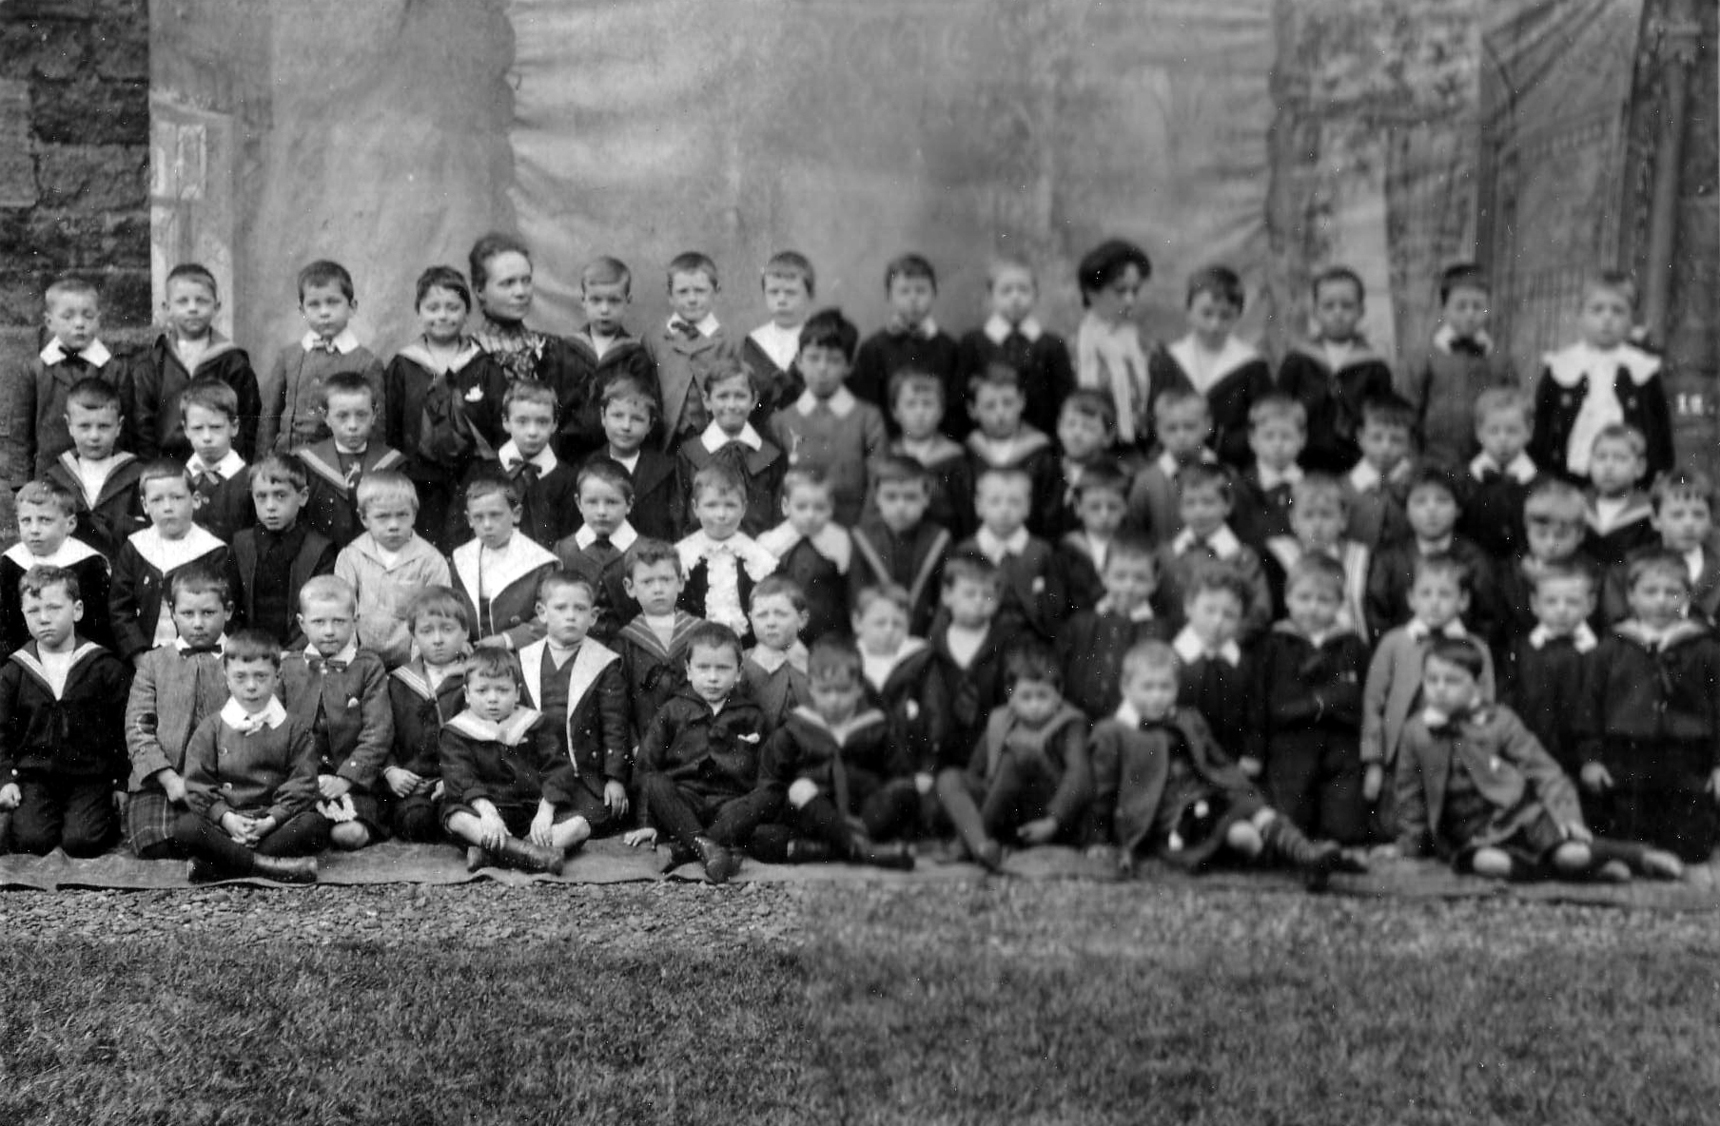 Unidentified School Class Portrait c.1900